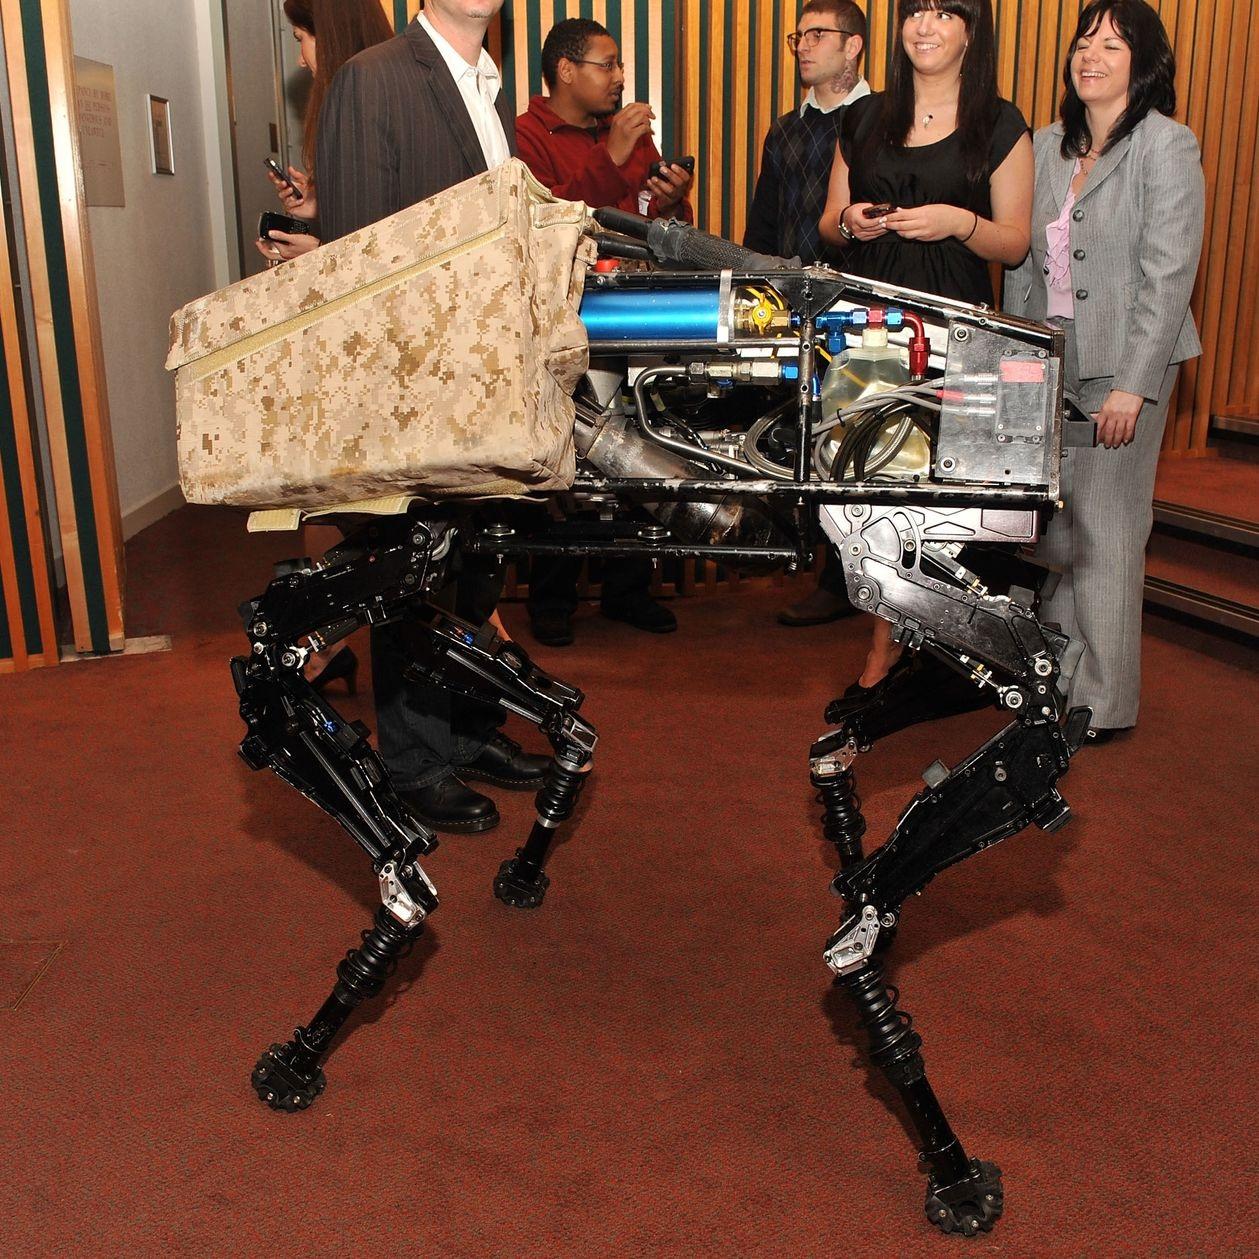 Robot at the 2011 Tribeca Disruptive Innovation Awards. PHOTO: SLAVEN VLASIC/GETTY IMAGES